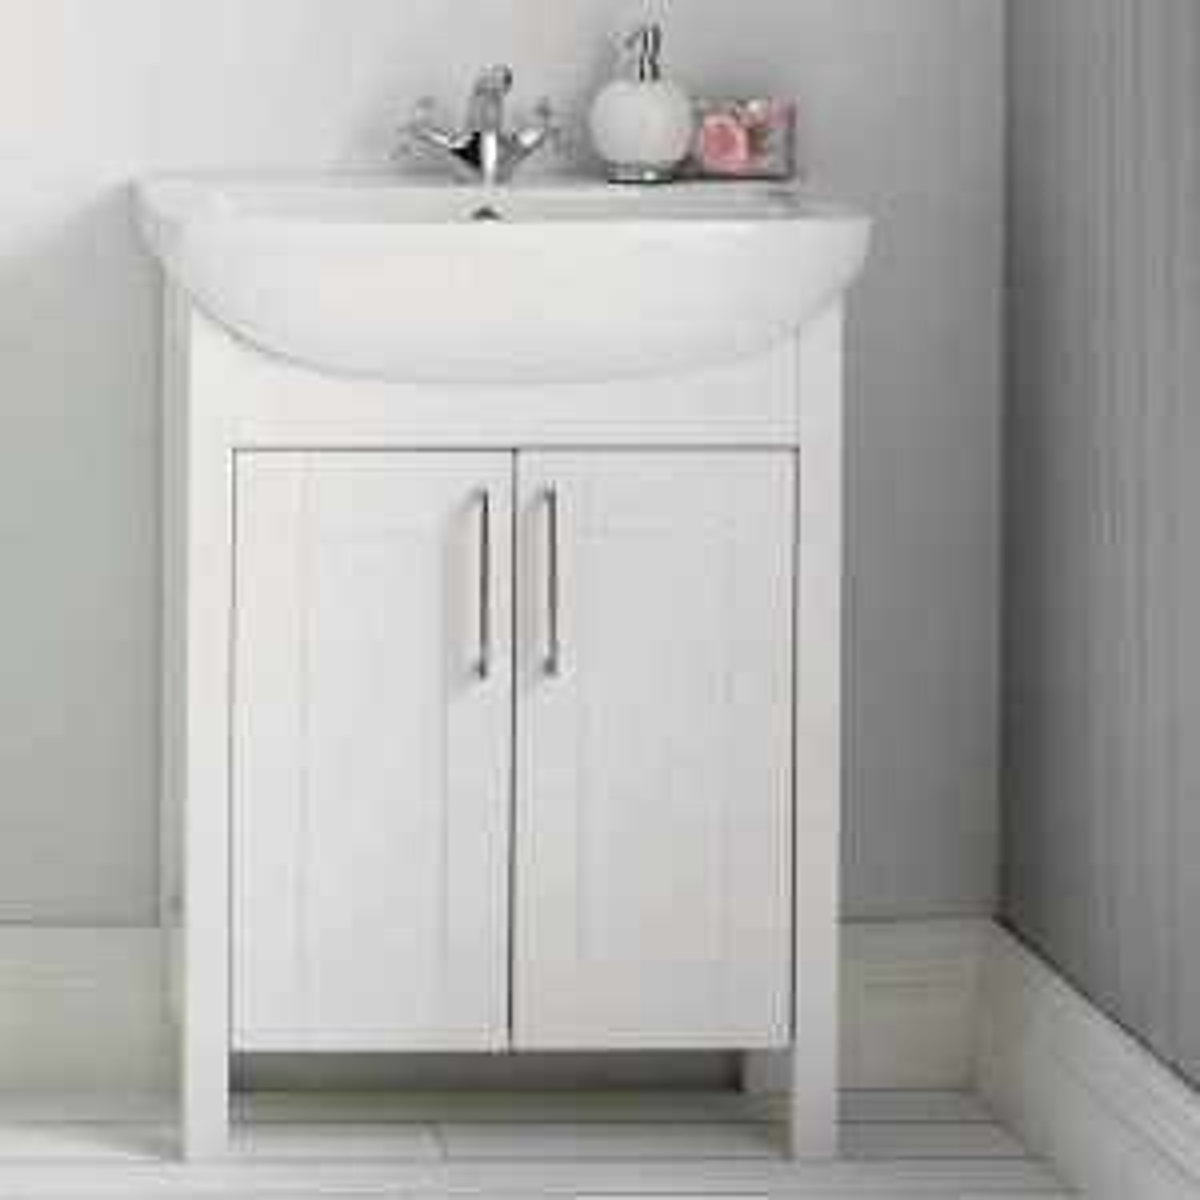 Elation Sendai White Gloss Vanity Unit with Basin 650mm